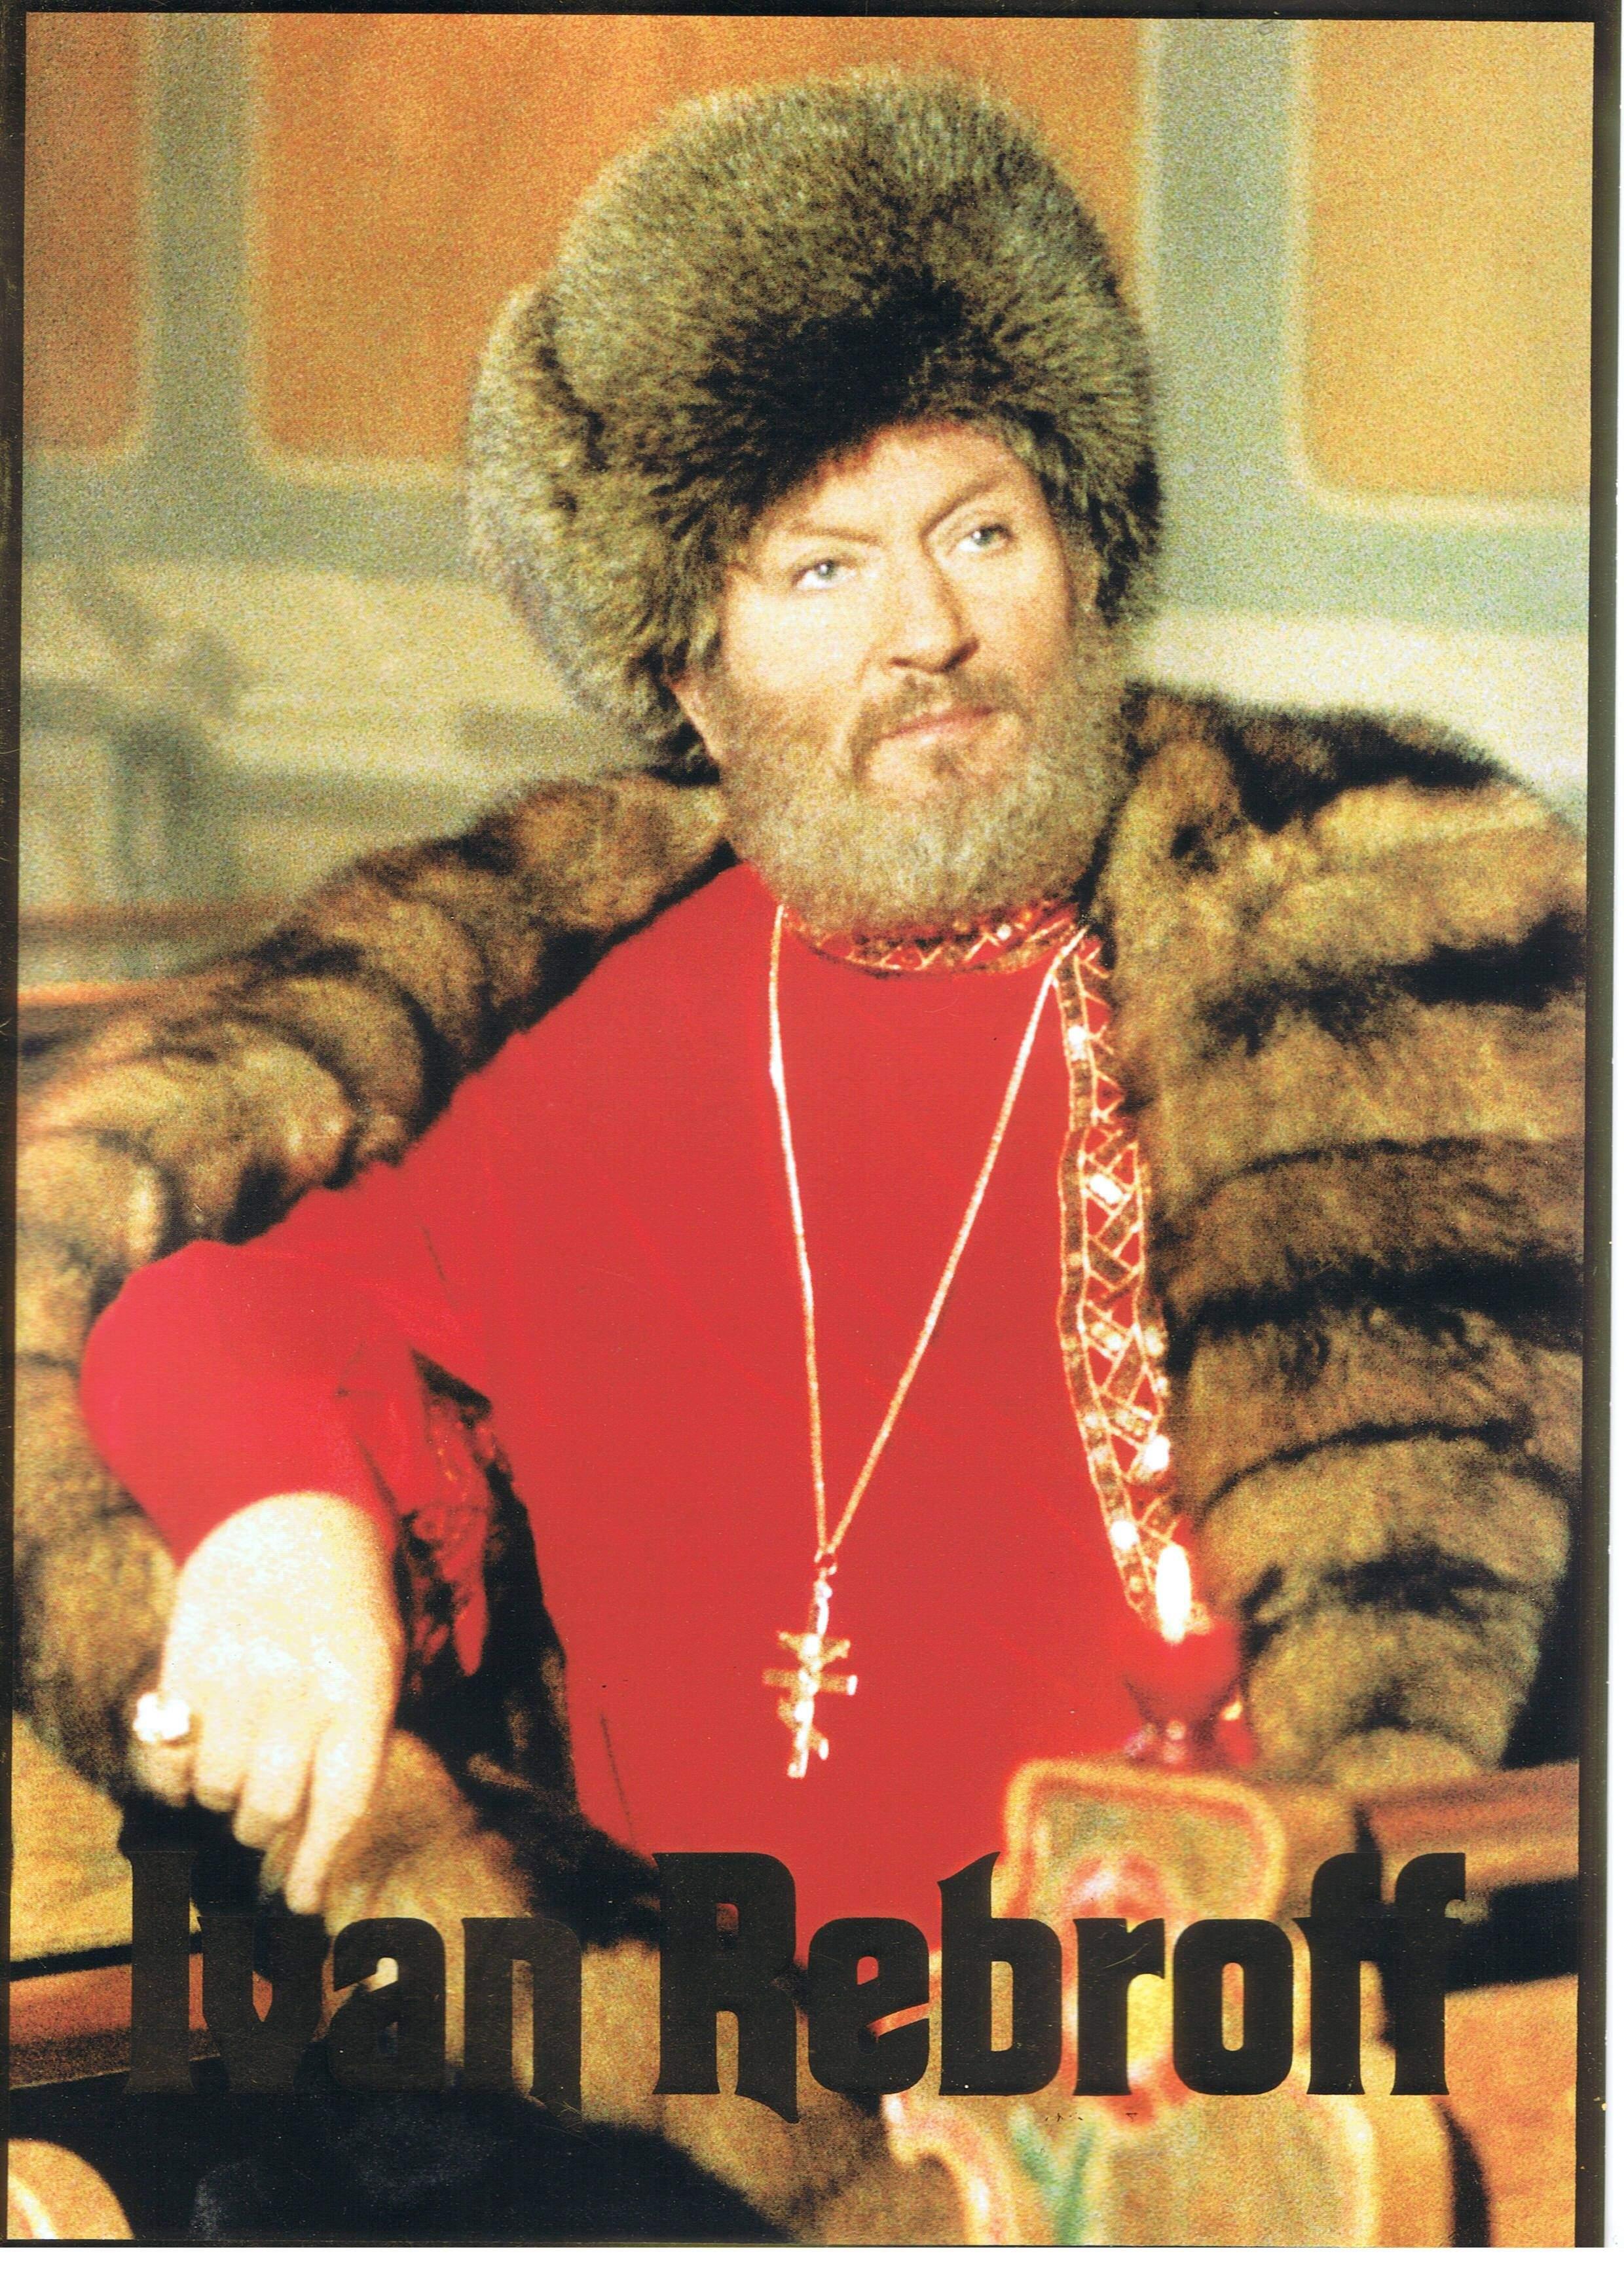 Ural Kosaken Chor - Gedenkkonzert - Erinnerung an Ivan Rebroff